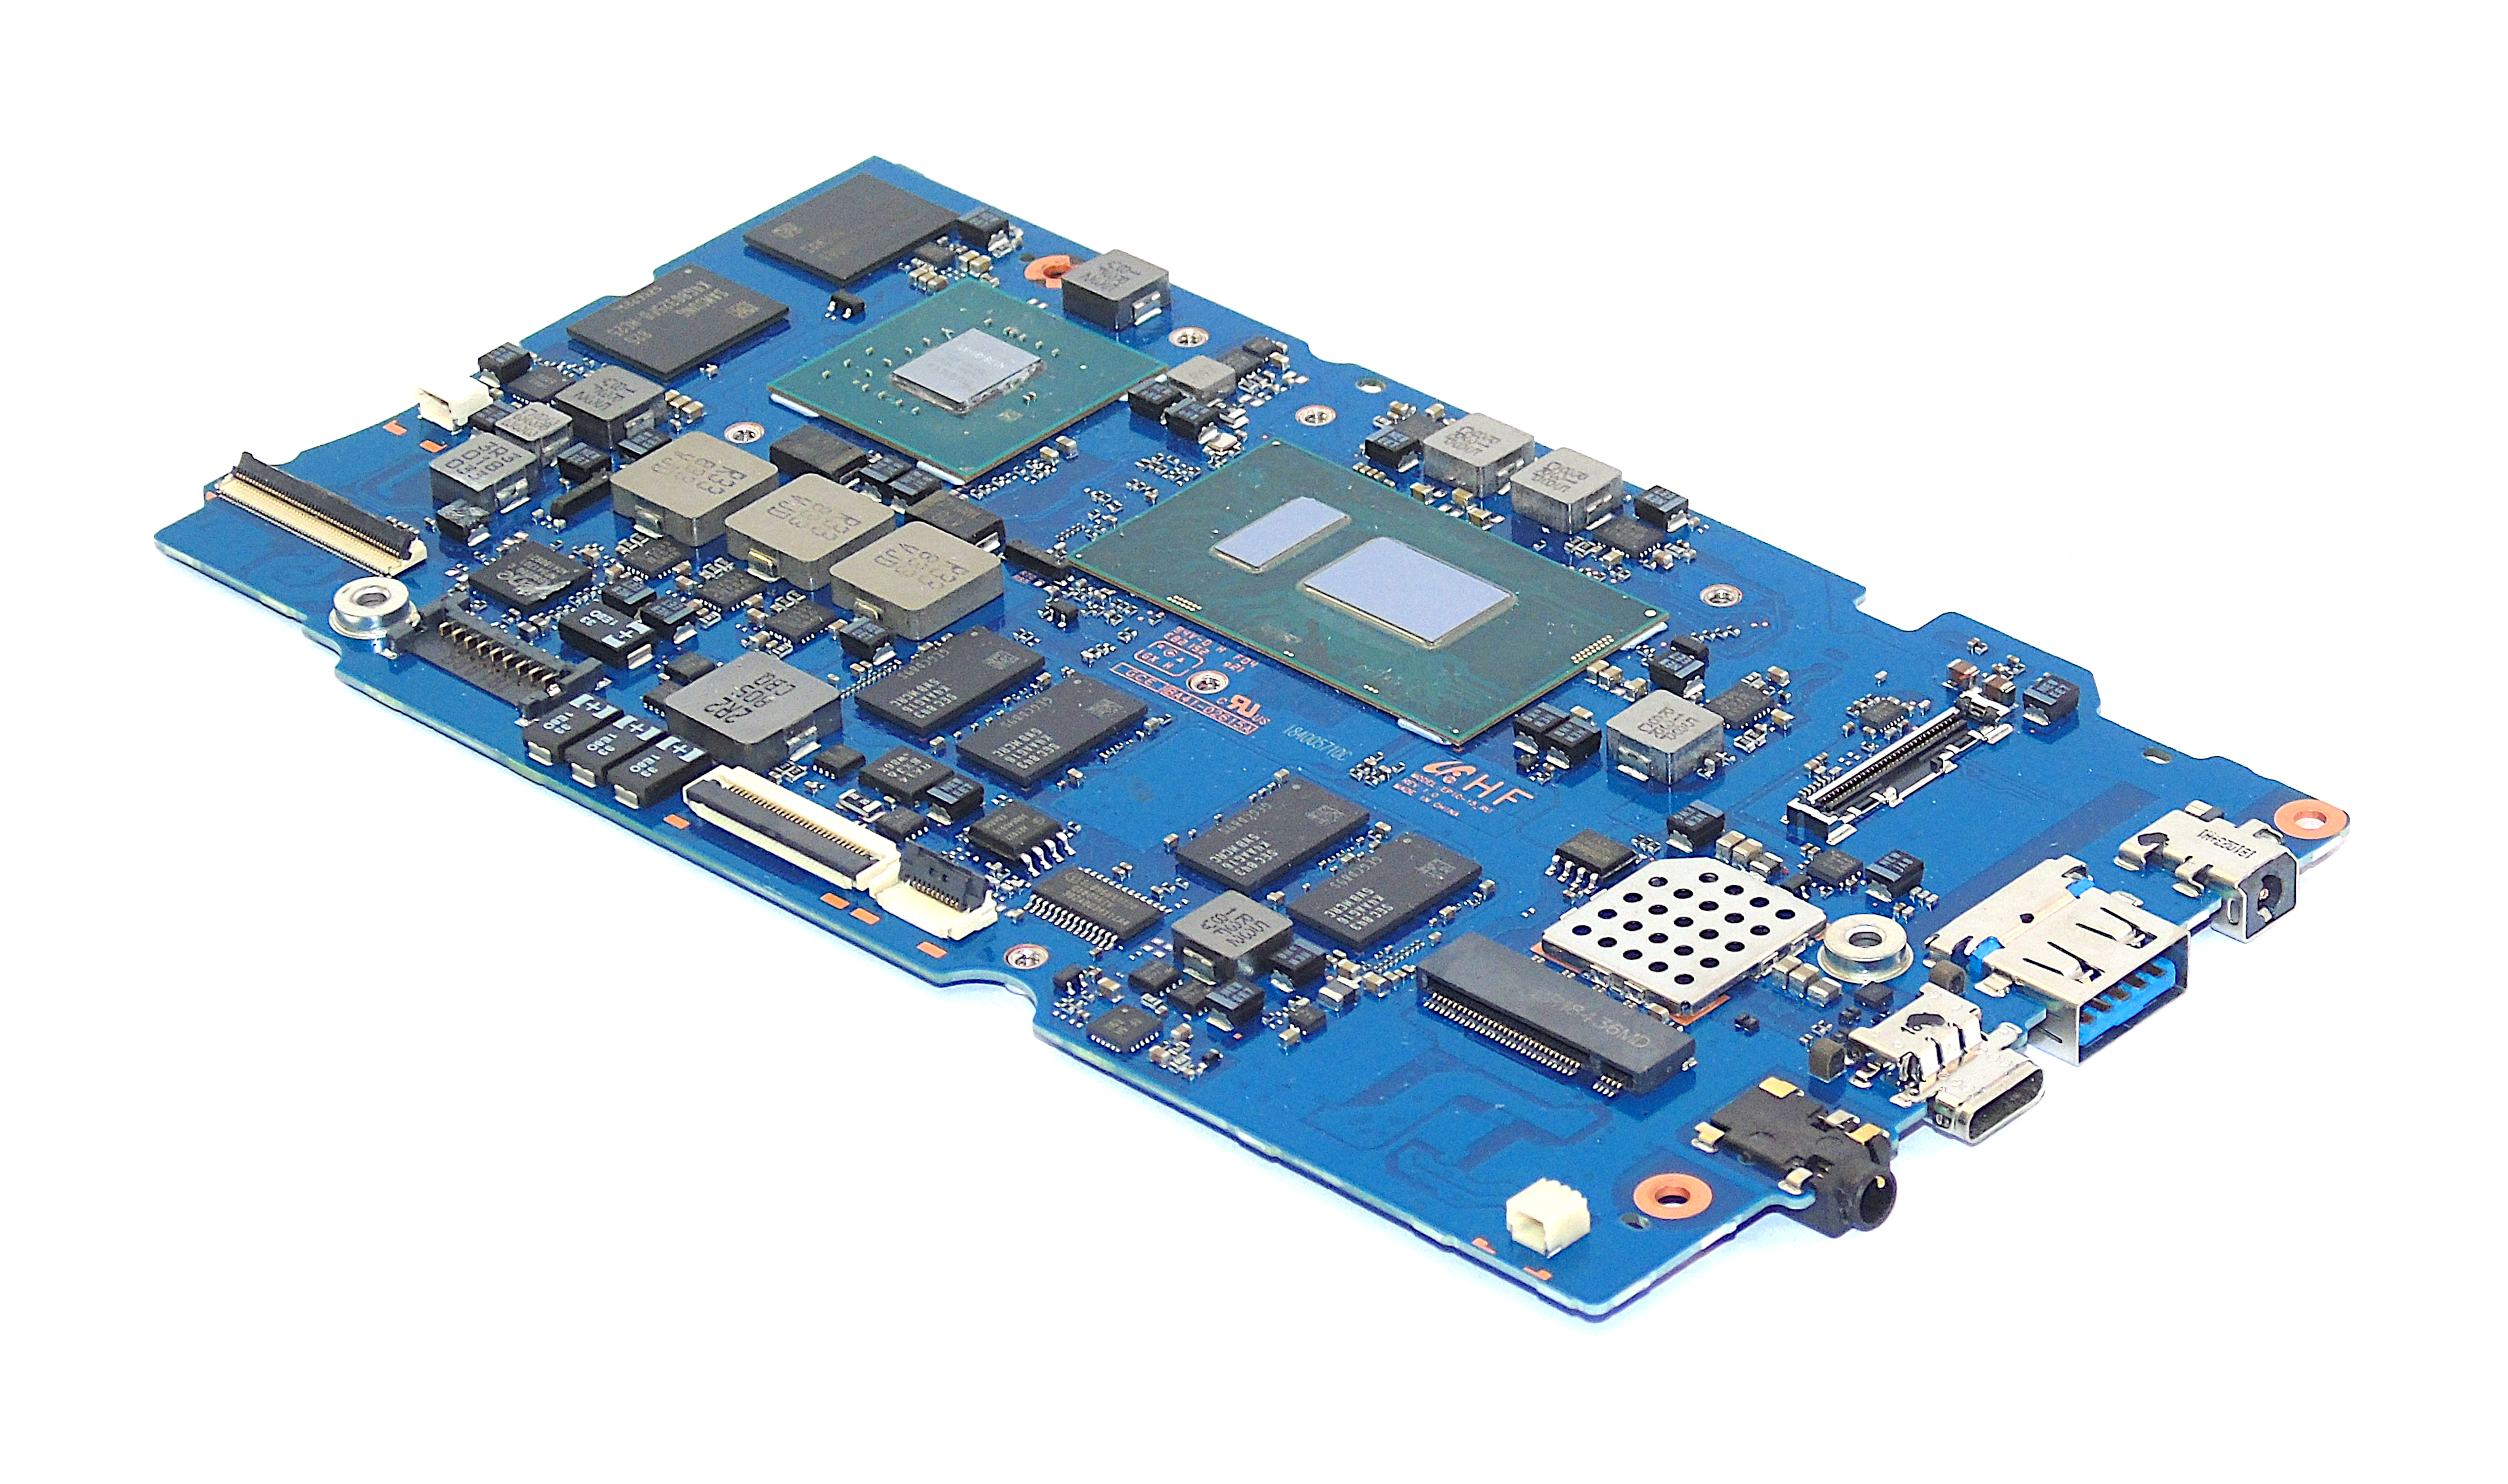 Samsung NP500X5T Intel Core i7-8550U Laptop Motherboard BA92-18134